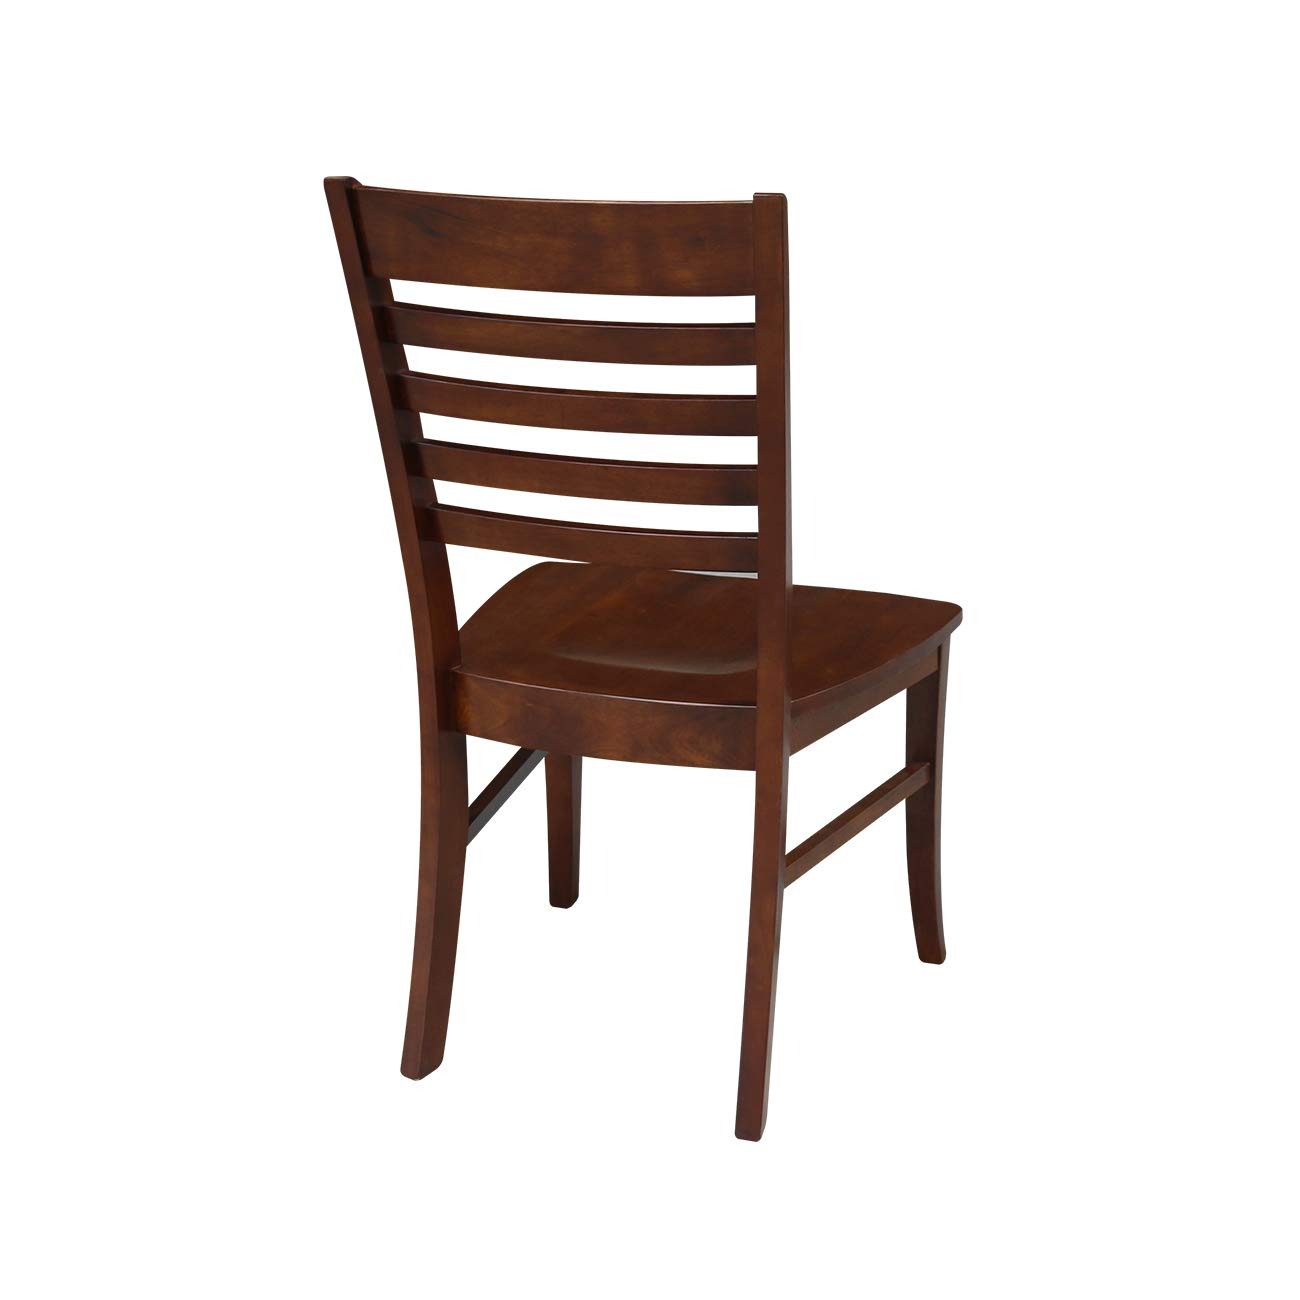 International Concepts Cosmo Roma Chair, Espresso